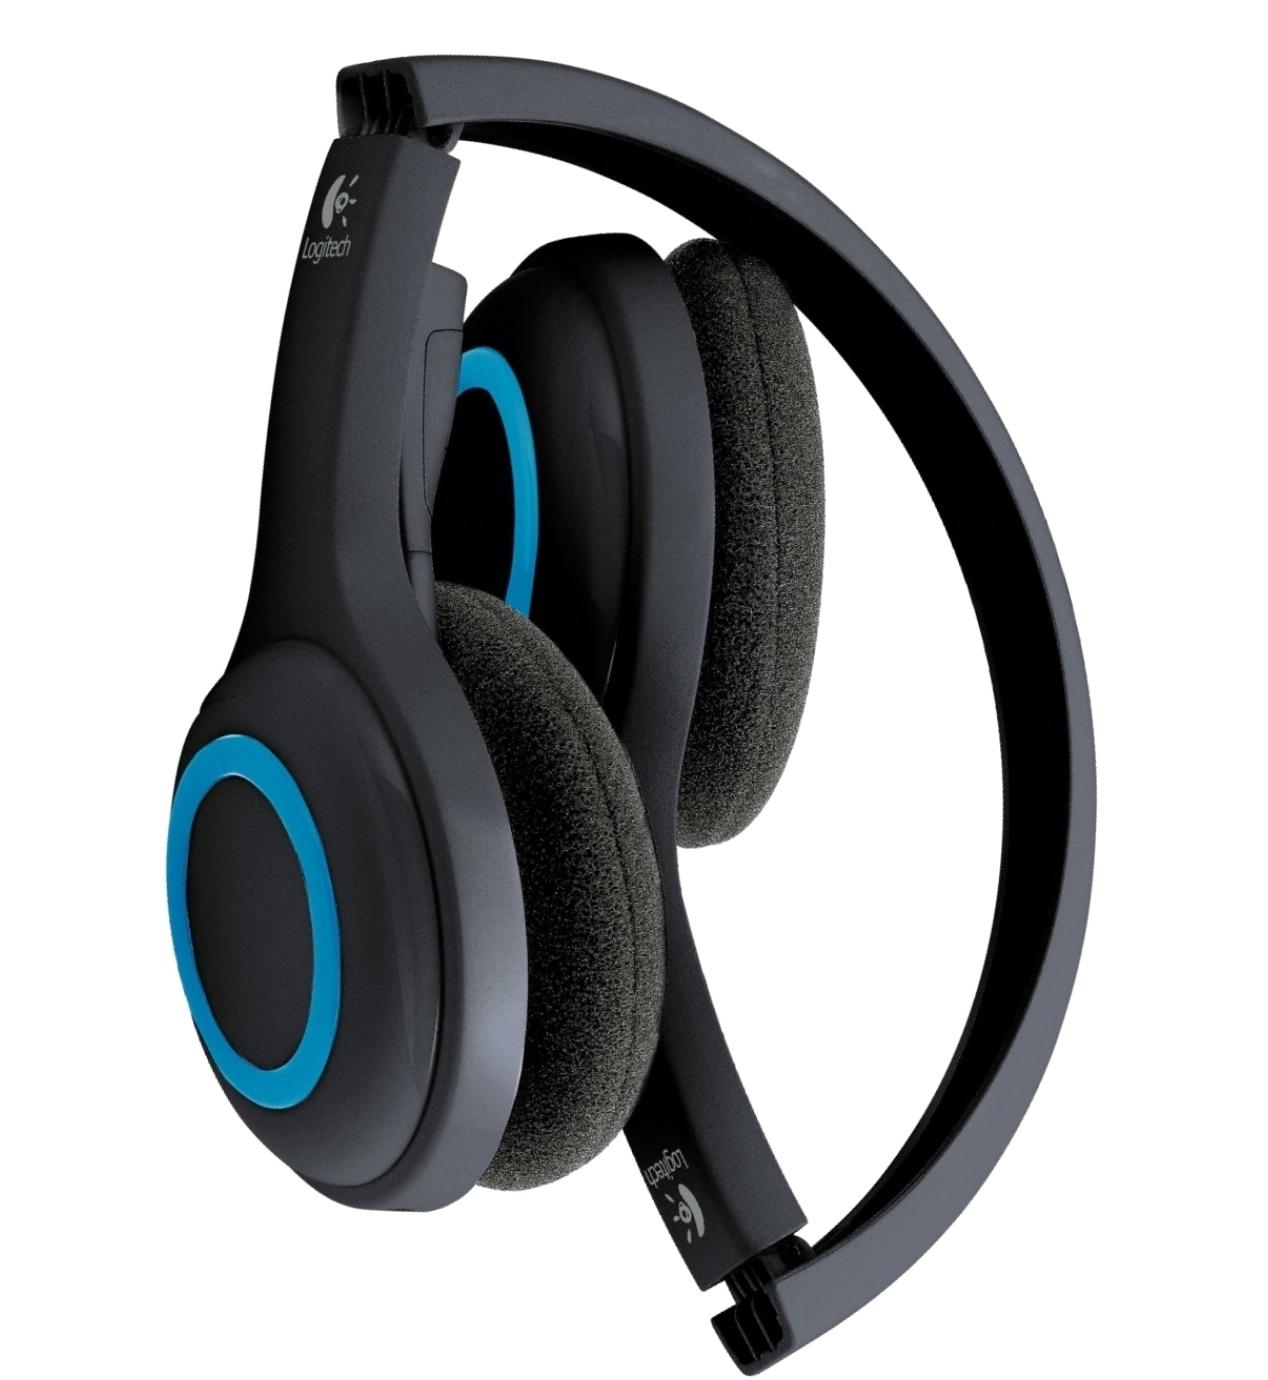 Logitech H600 USB Wireless Headset image